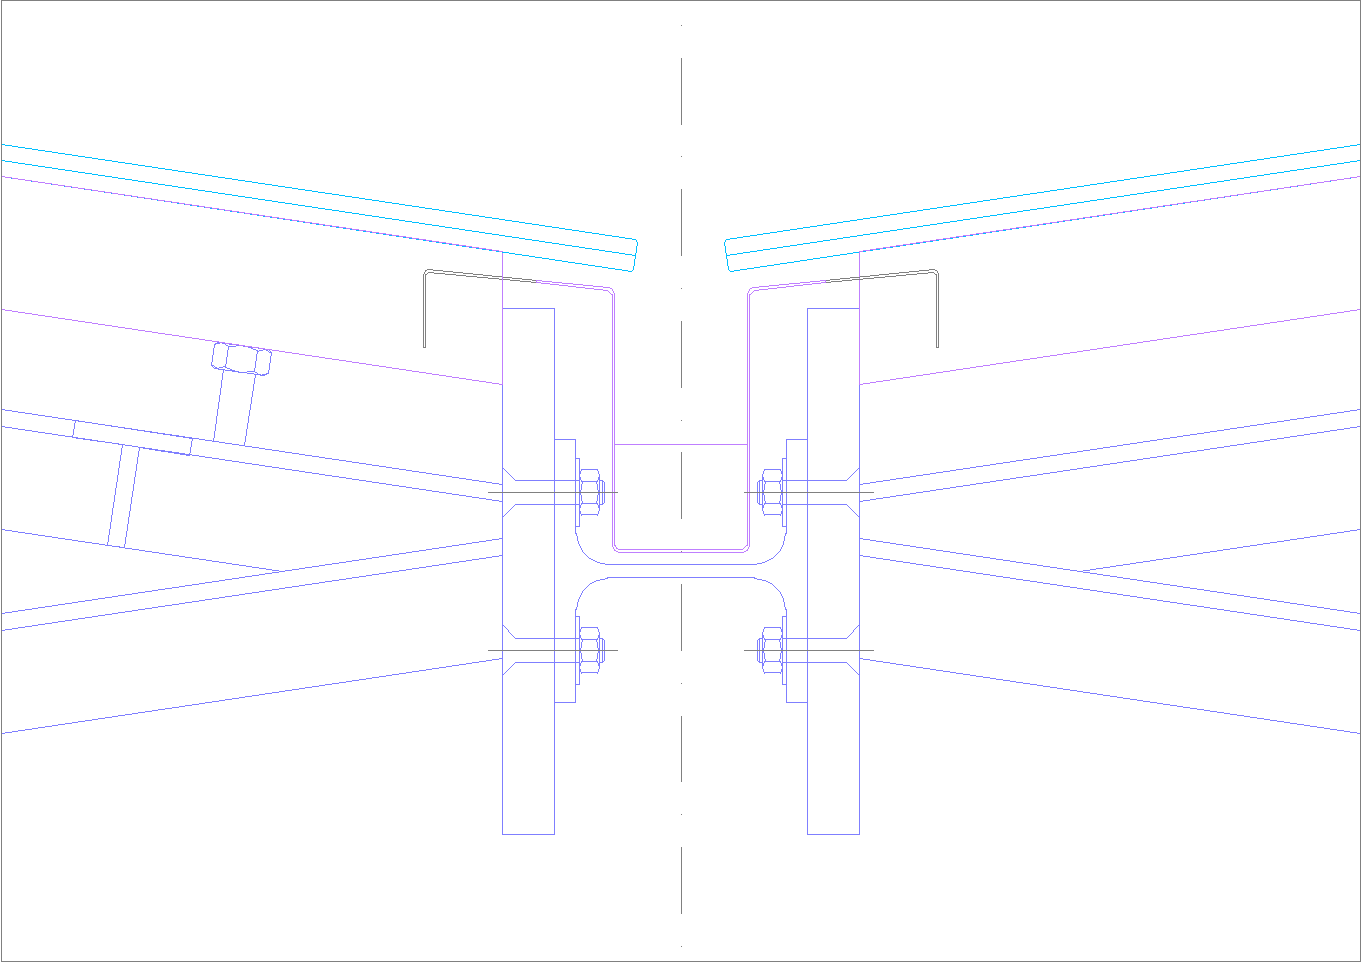 nodo-pensilina-fedrizzi-2020-model